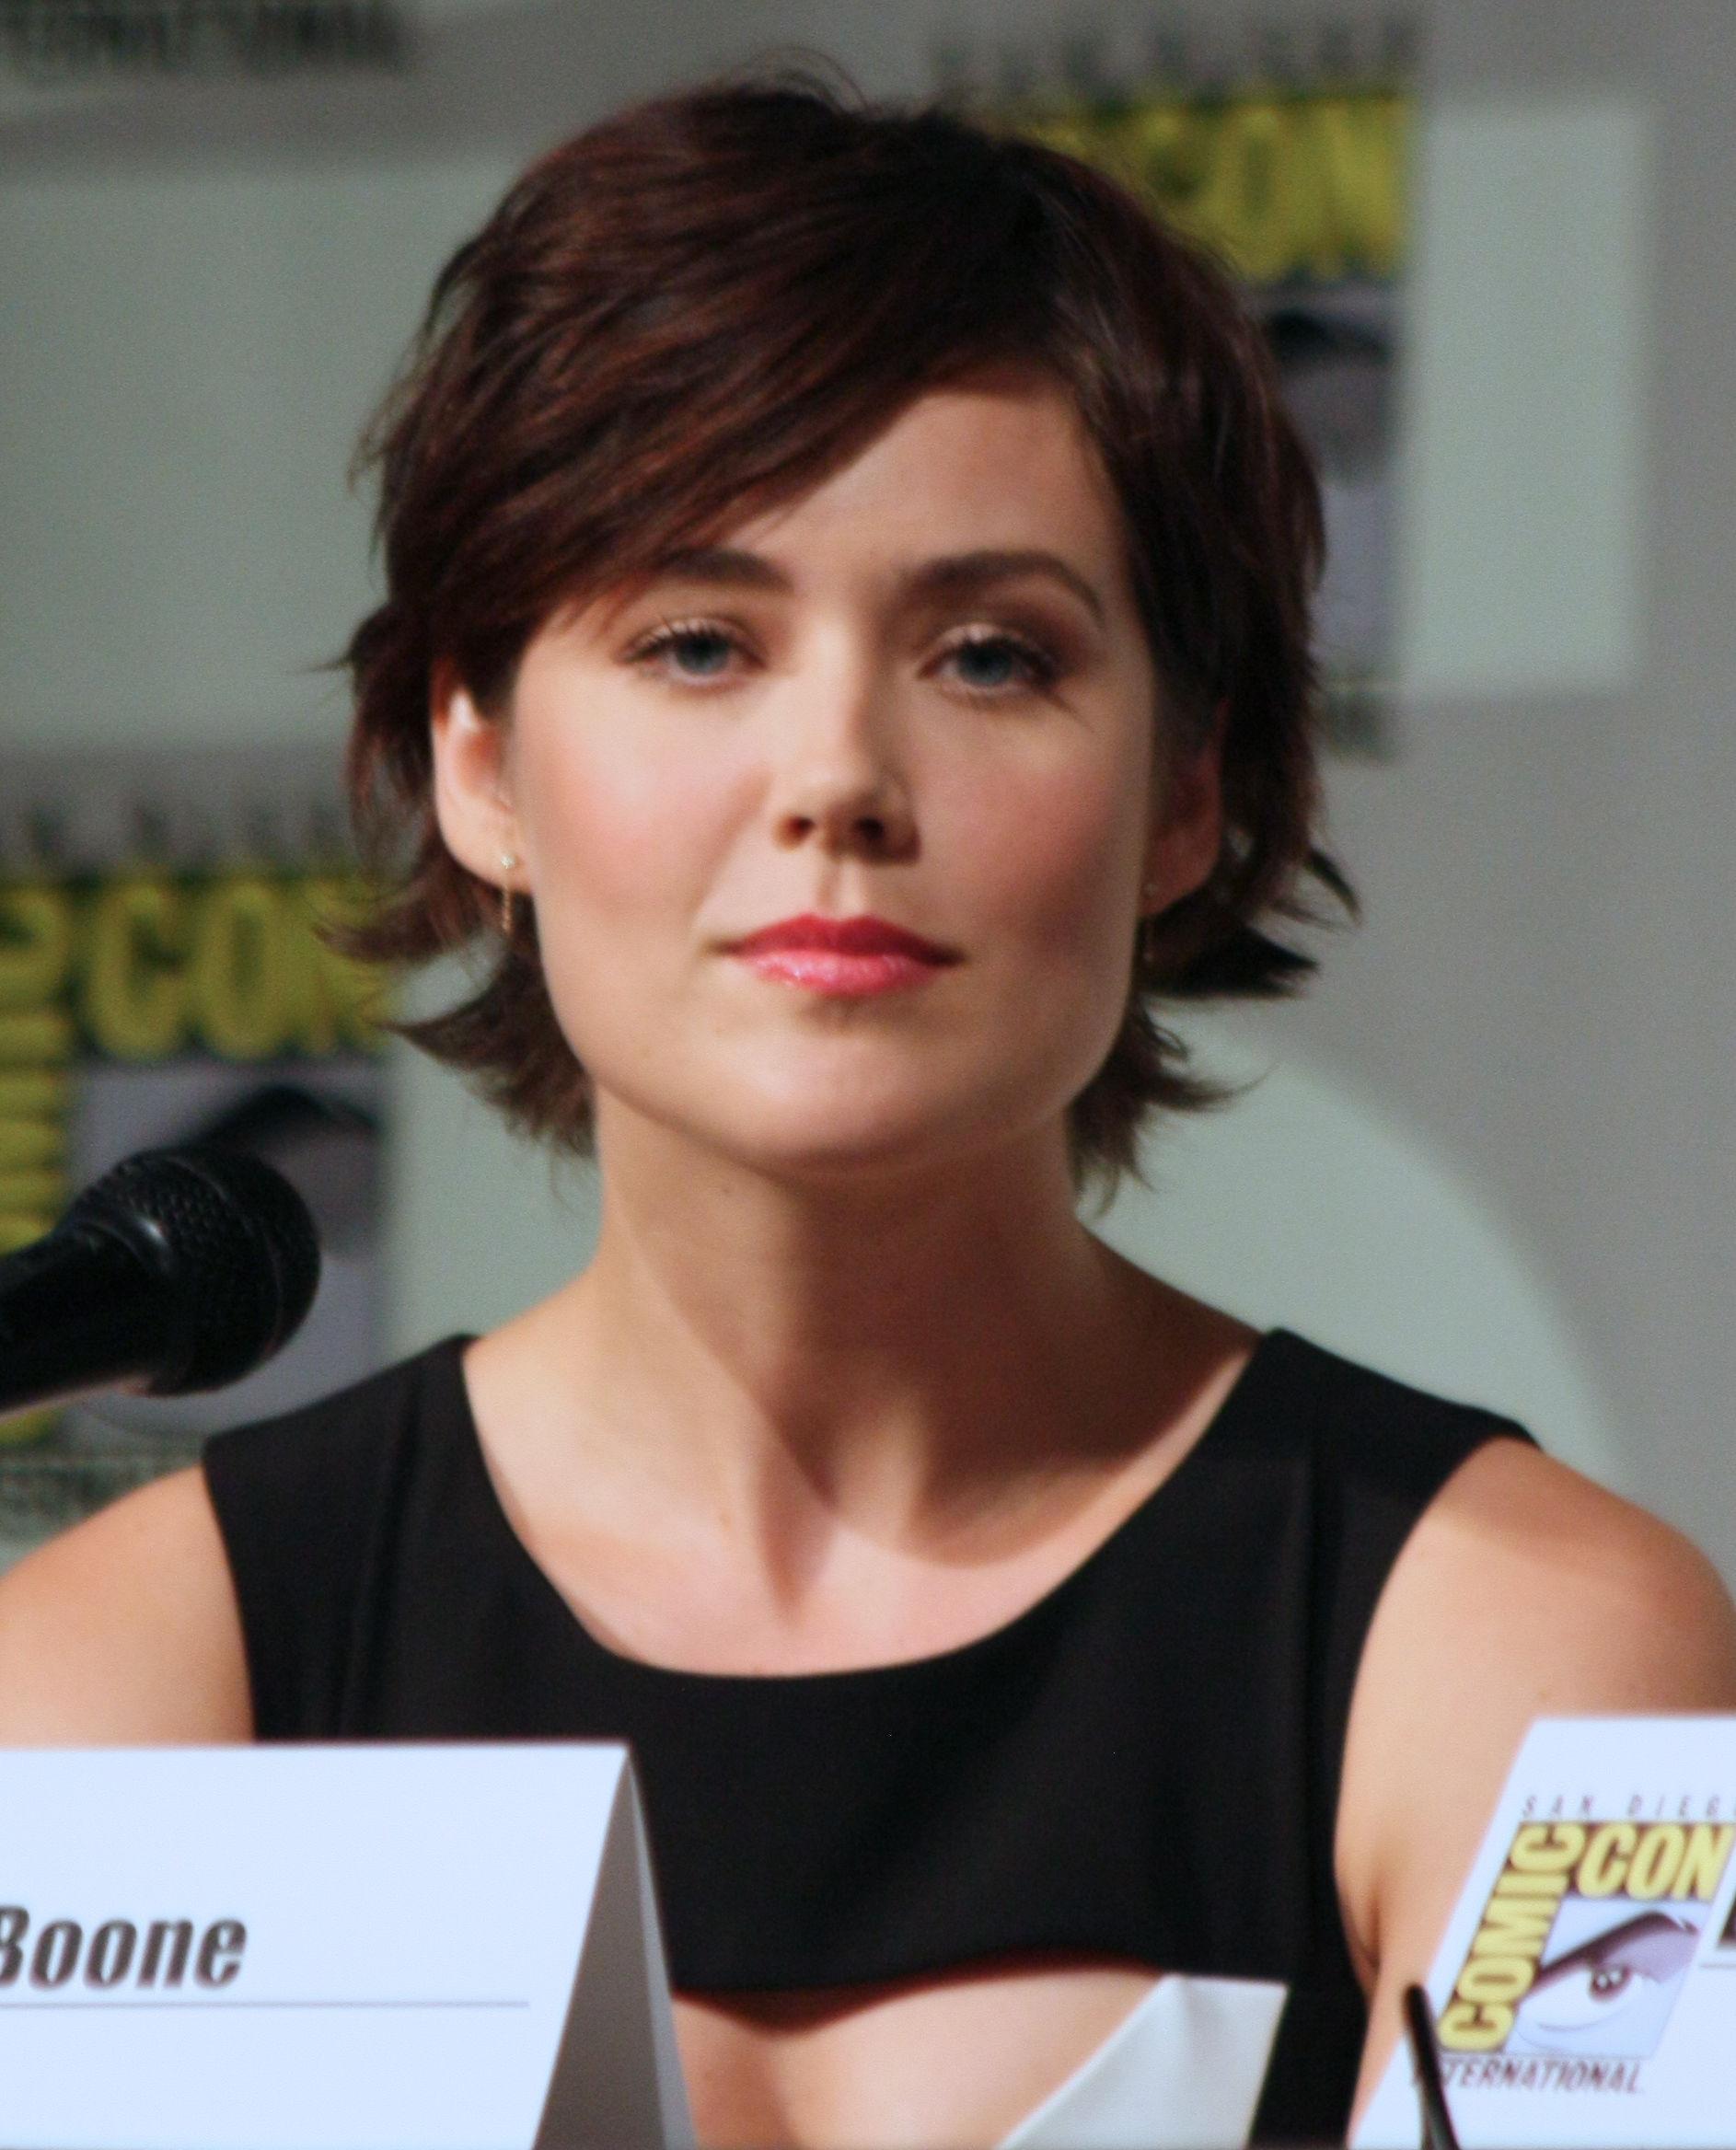 Photo of Megan Boone: American actress